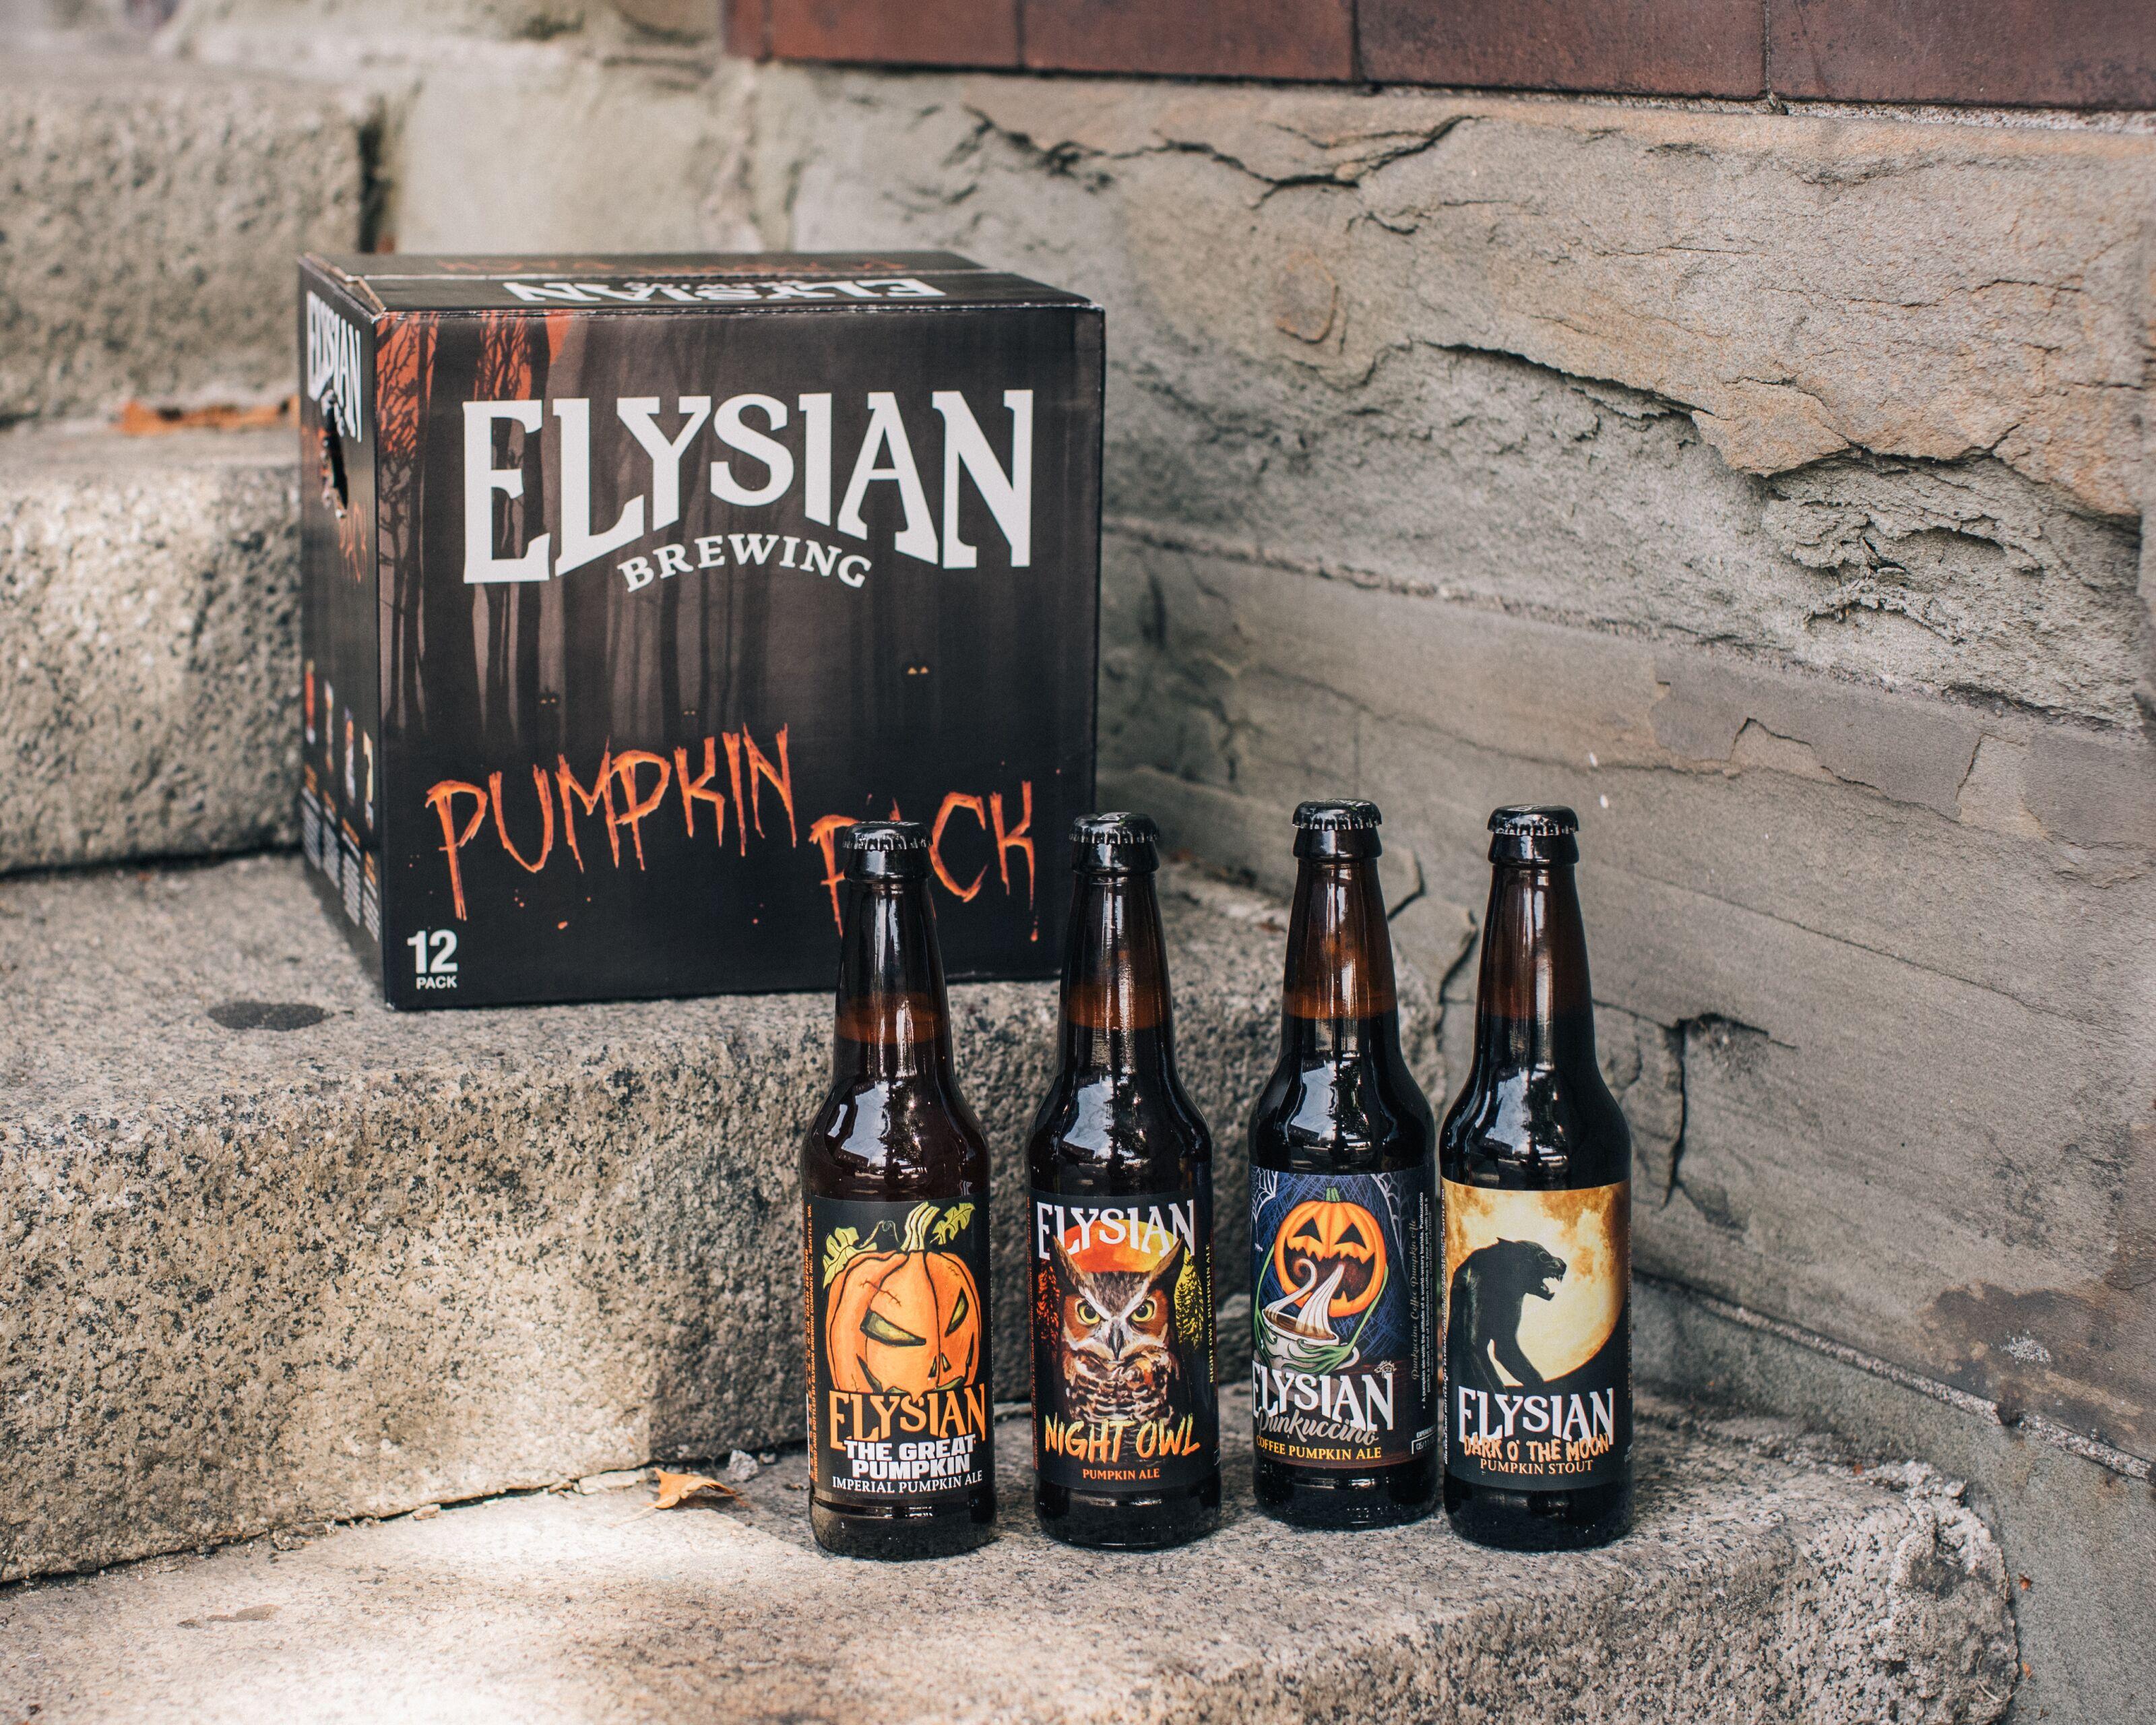 Elysian Brewing takes on Pumpkin Spice with seasonal favorites